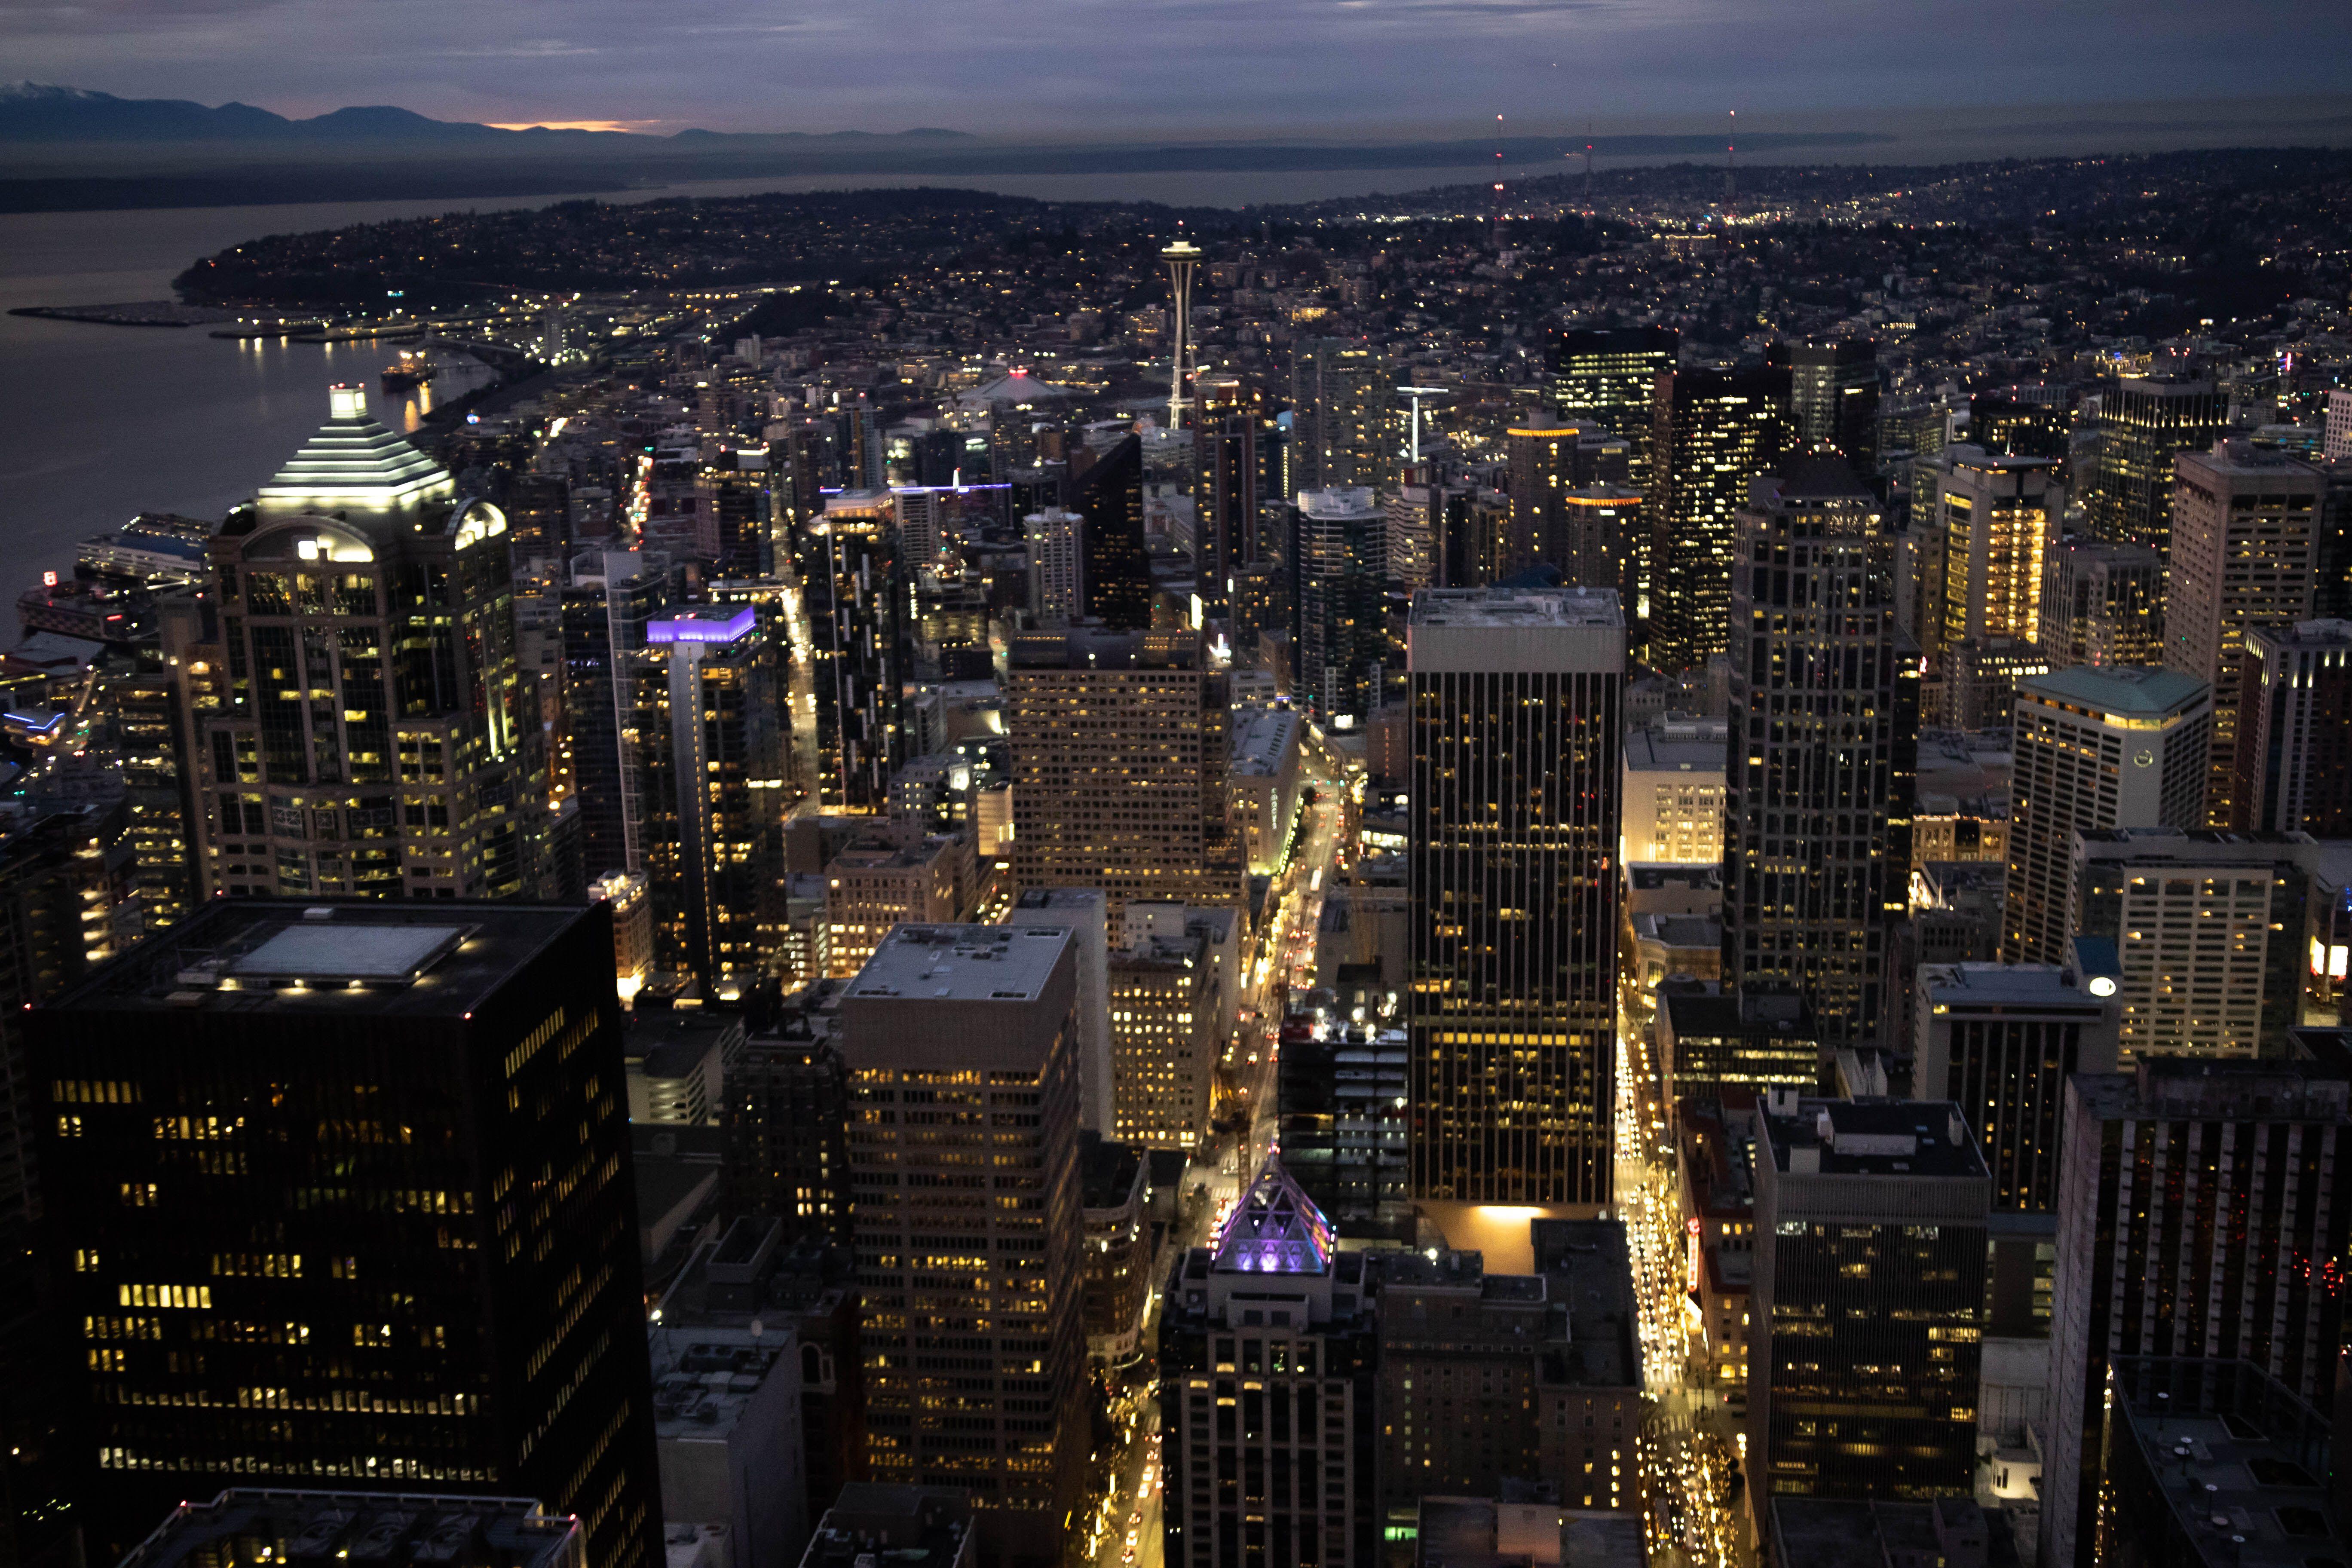 Seattle skyline lit at night